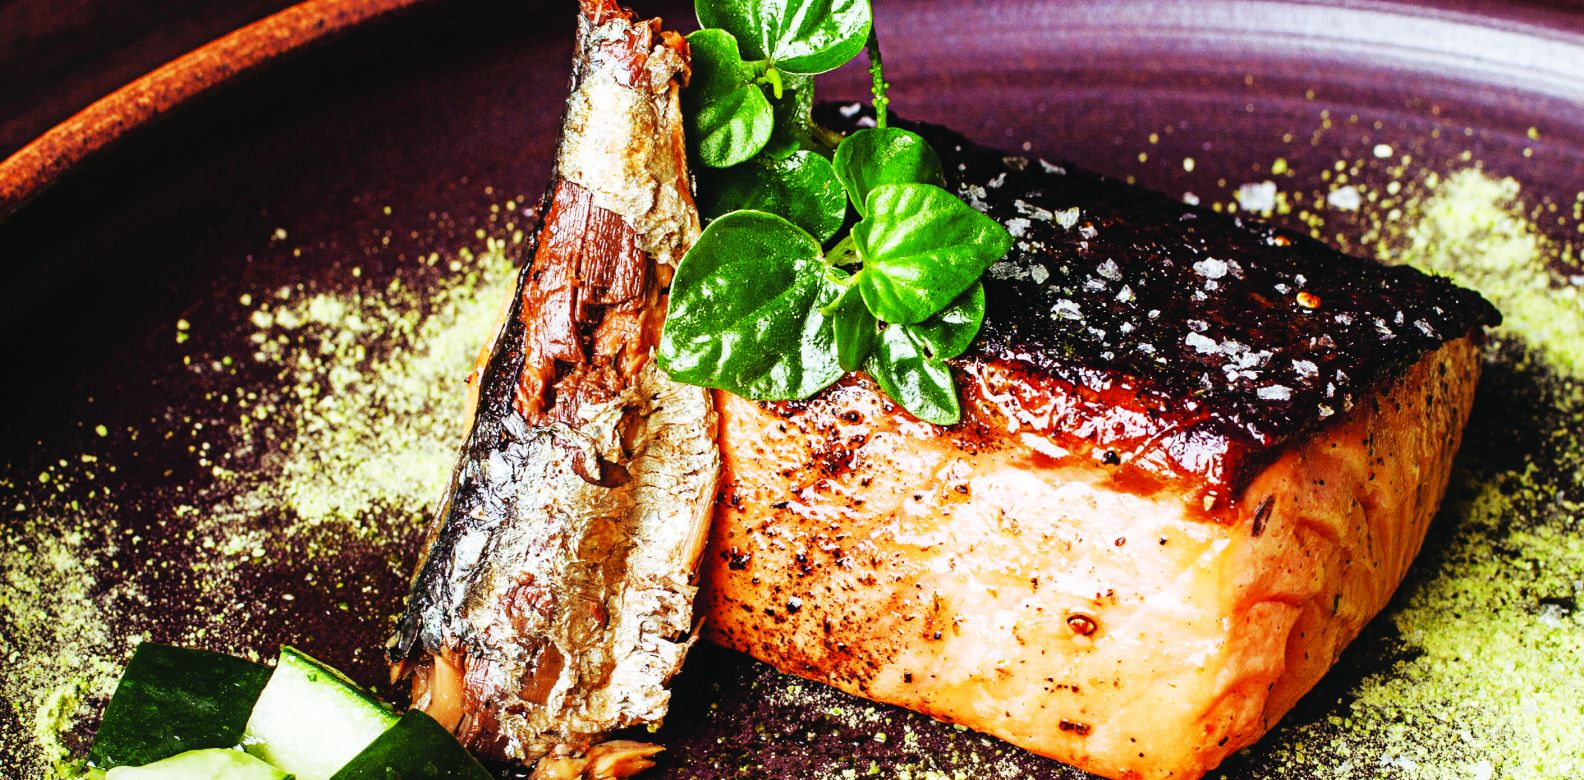 Salmon 63 degrees with organic sardines